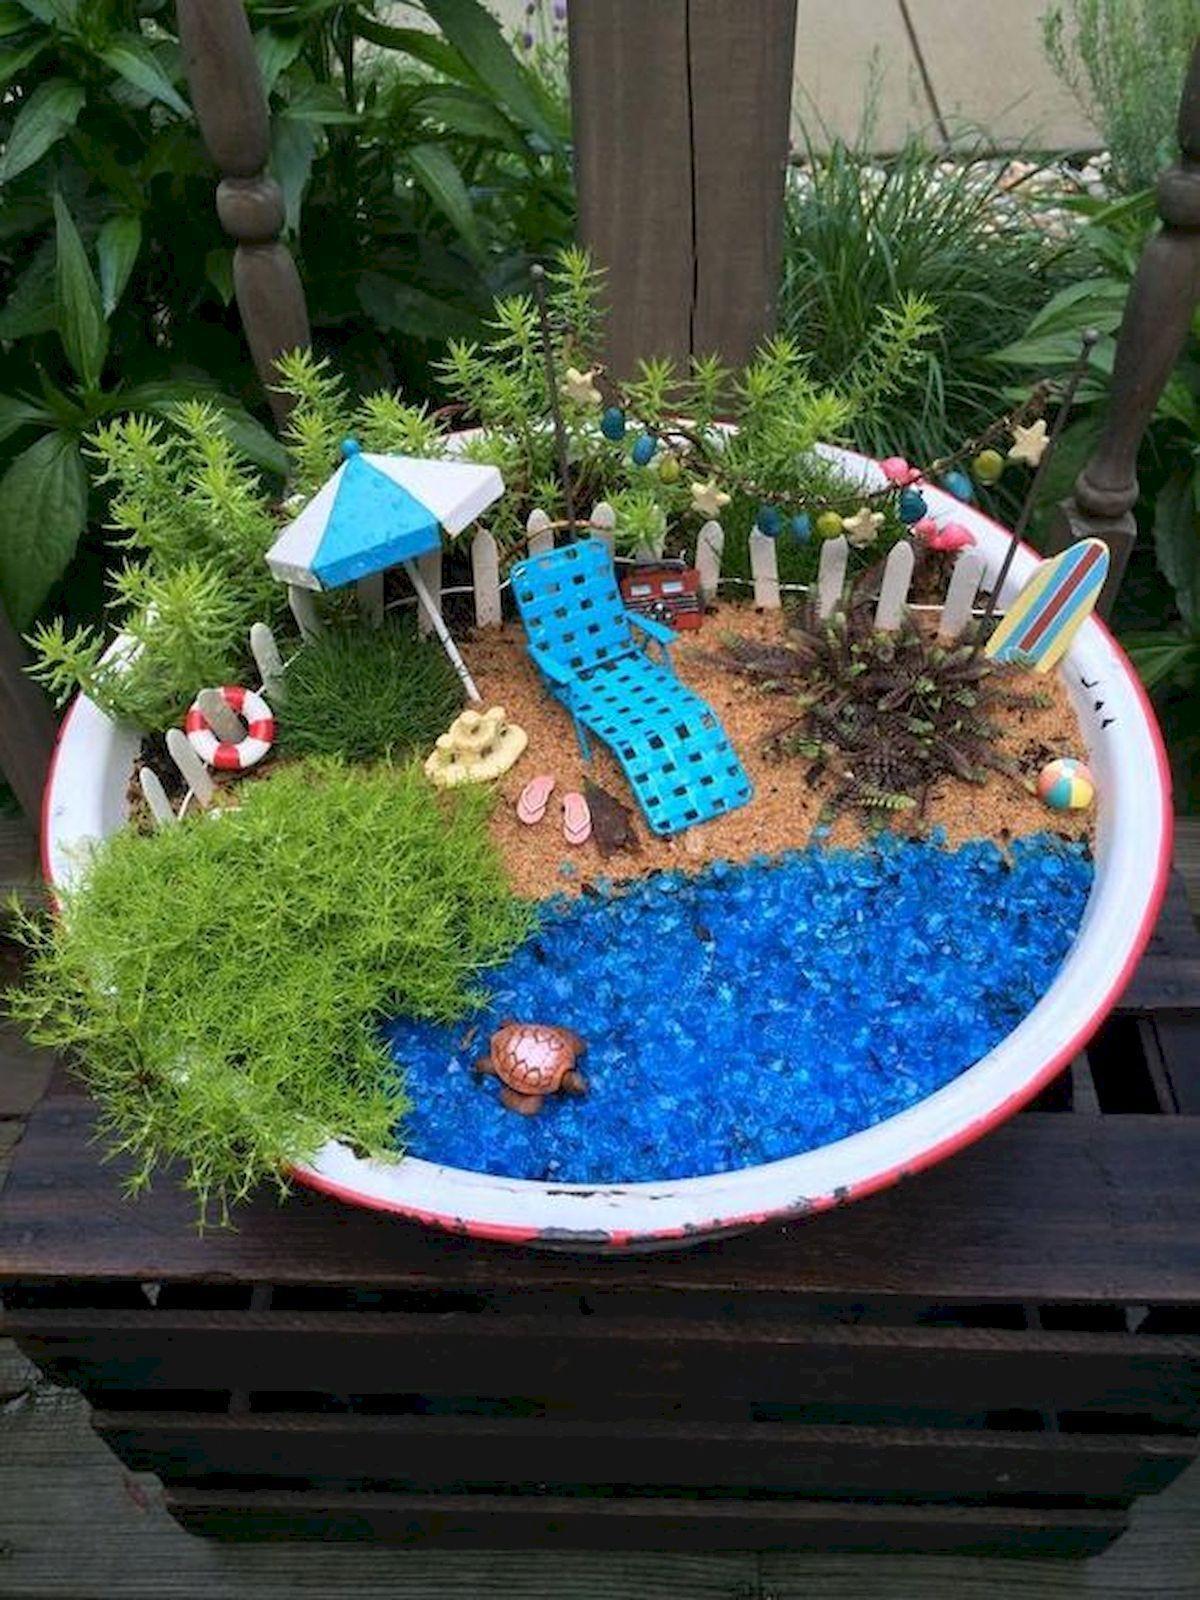 c3d88a40ecc173fa182d664217ae77e0 - Fairy Gardens For Kids To Make